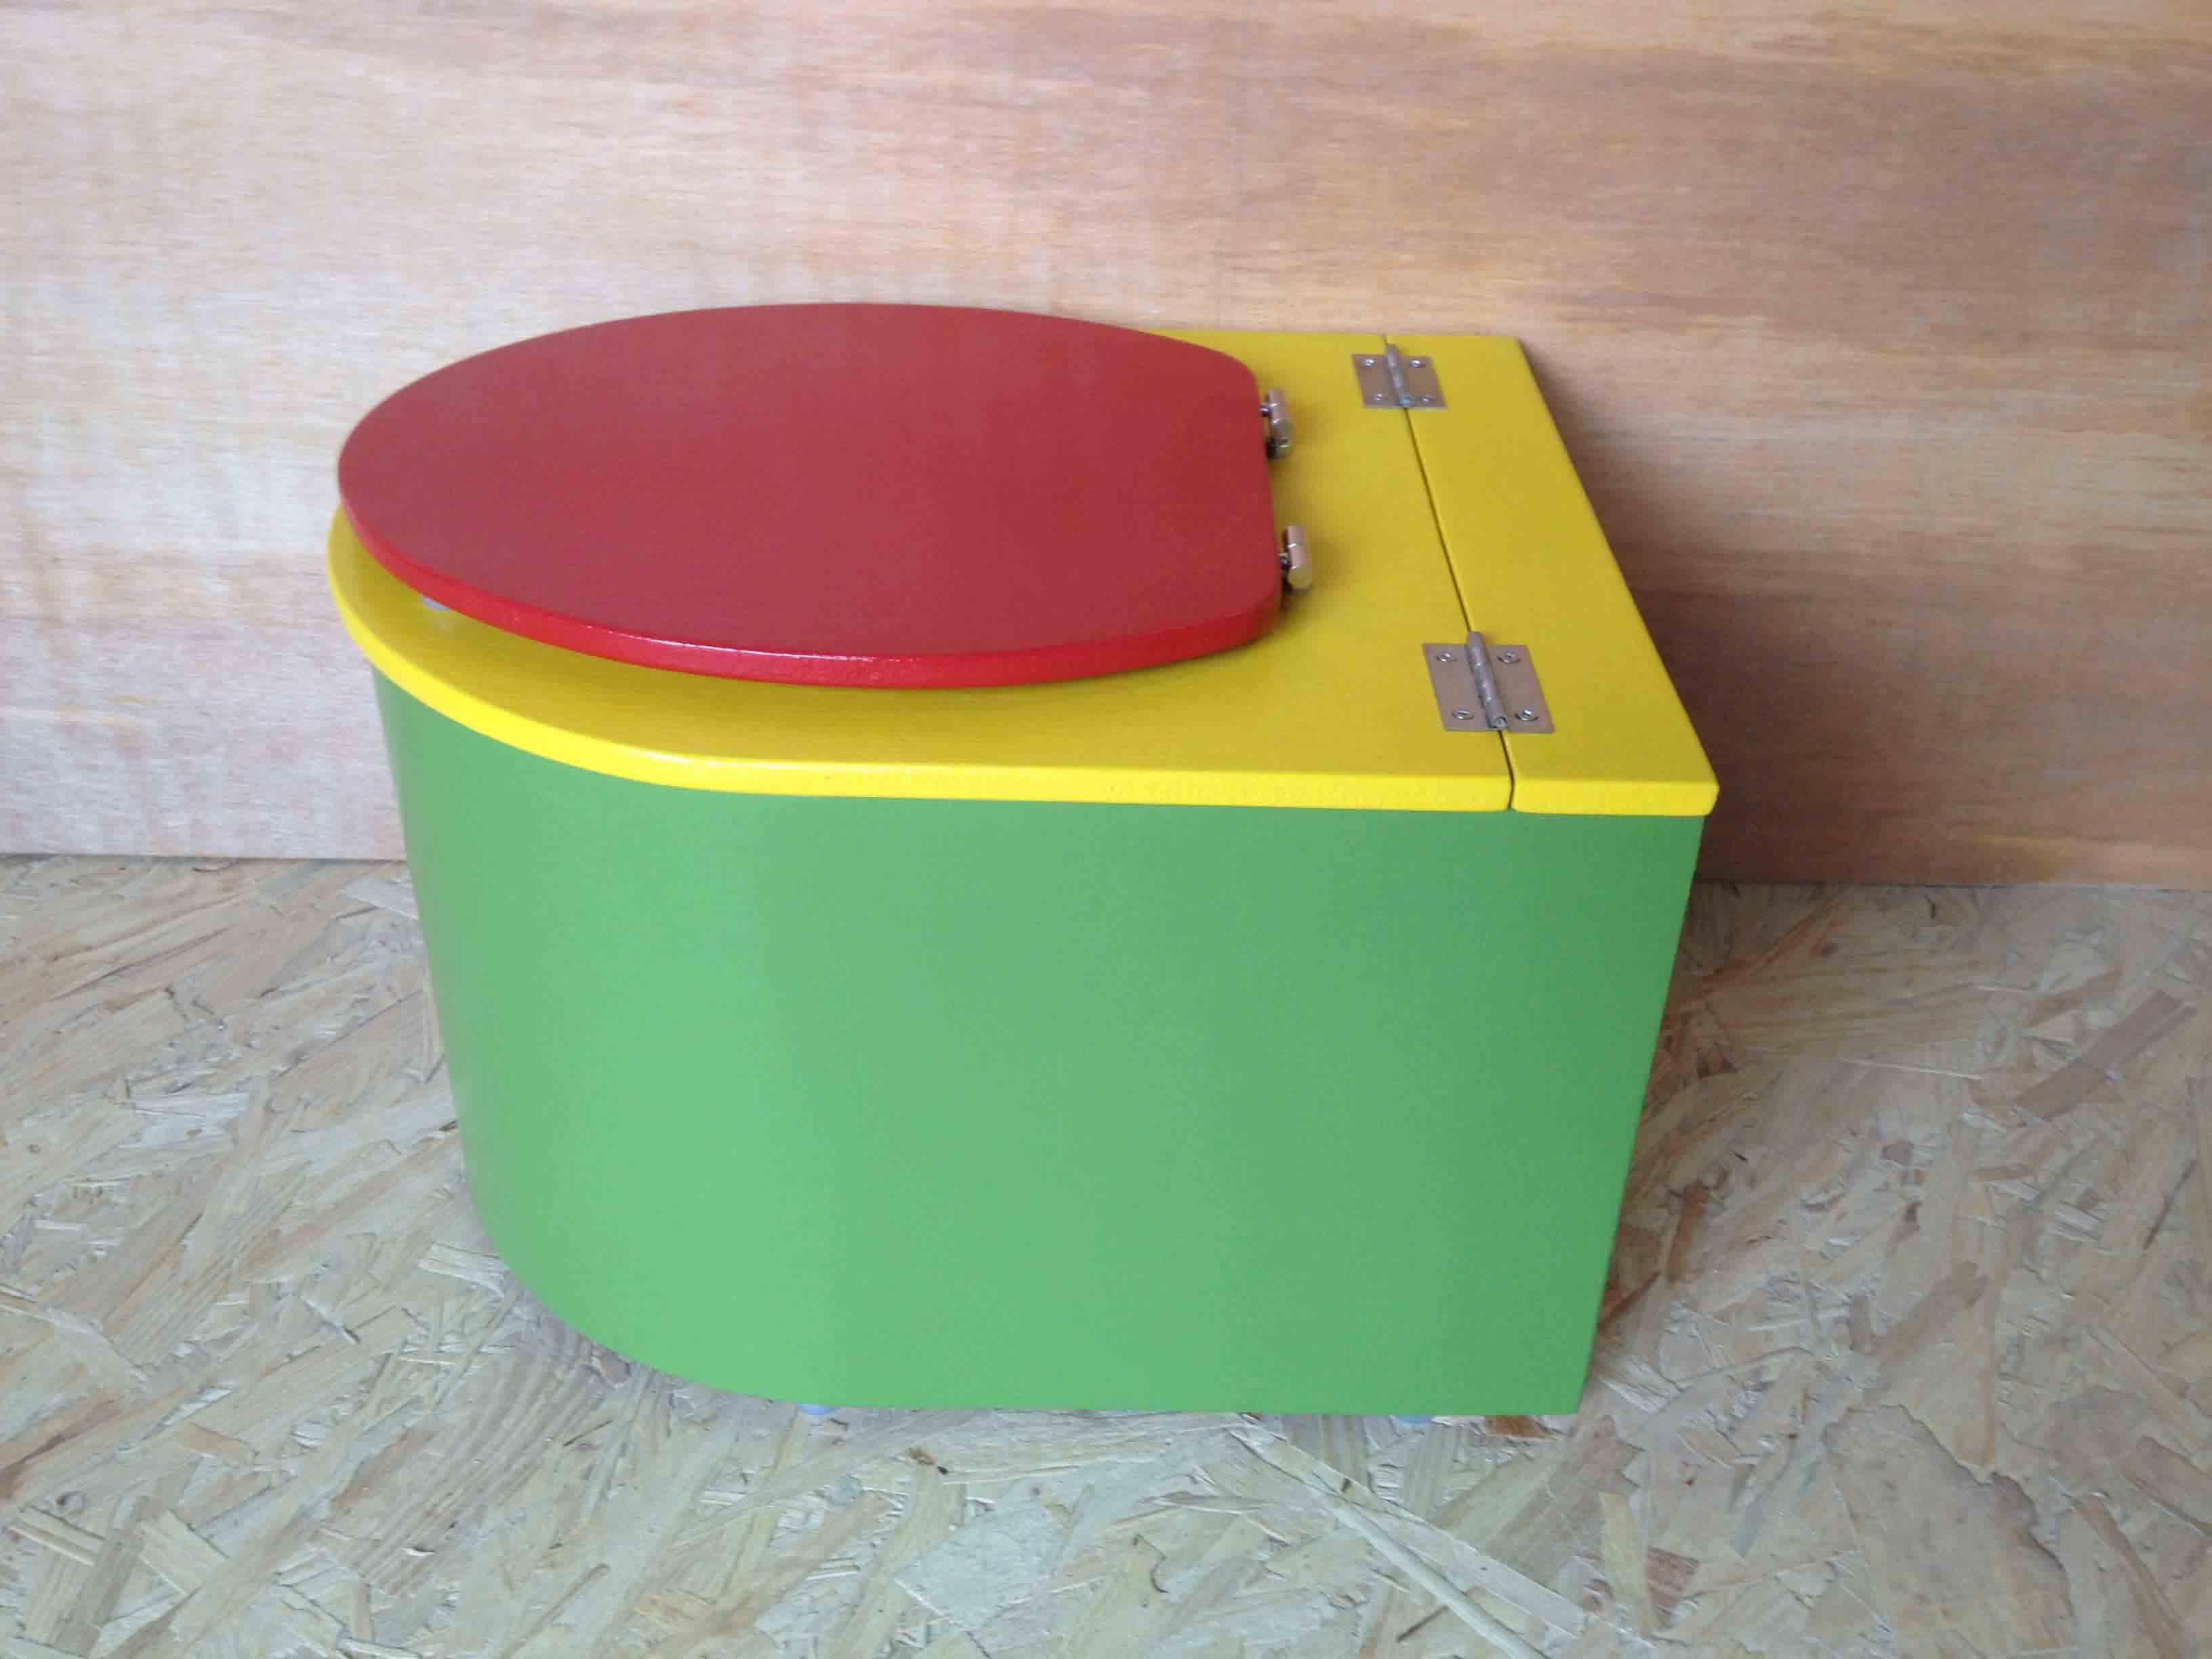 mini toilette seche vert jaune rouge